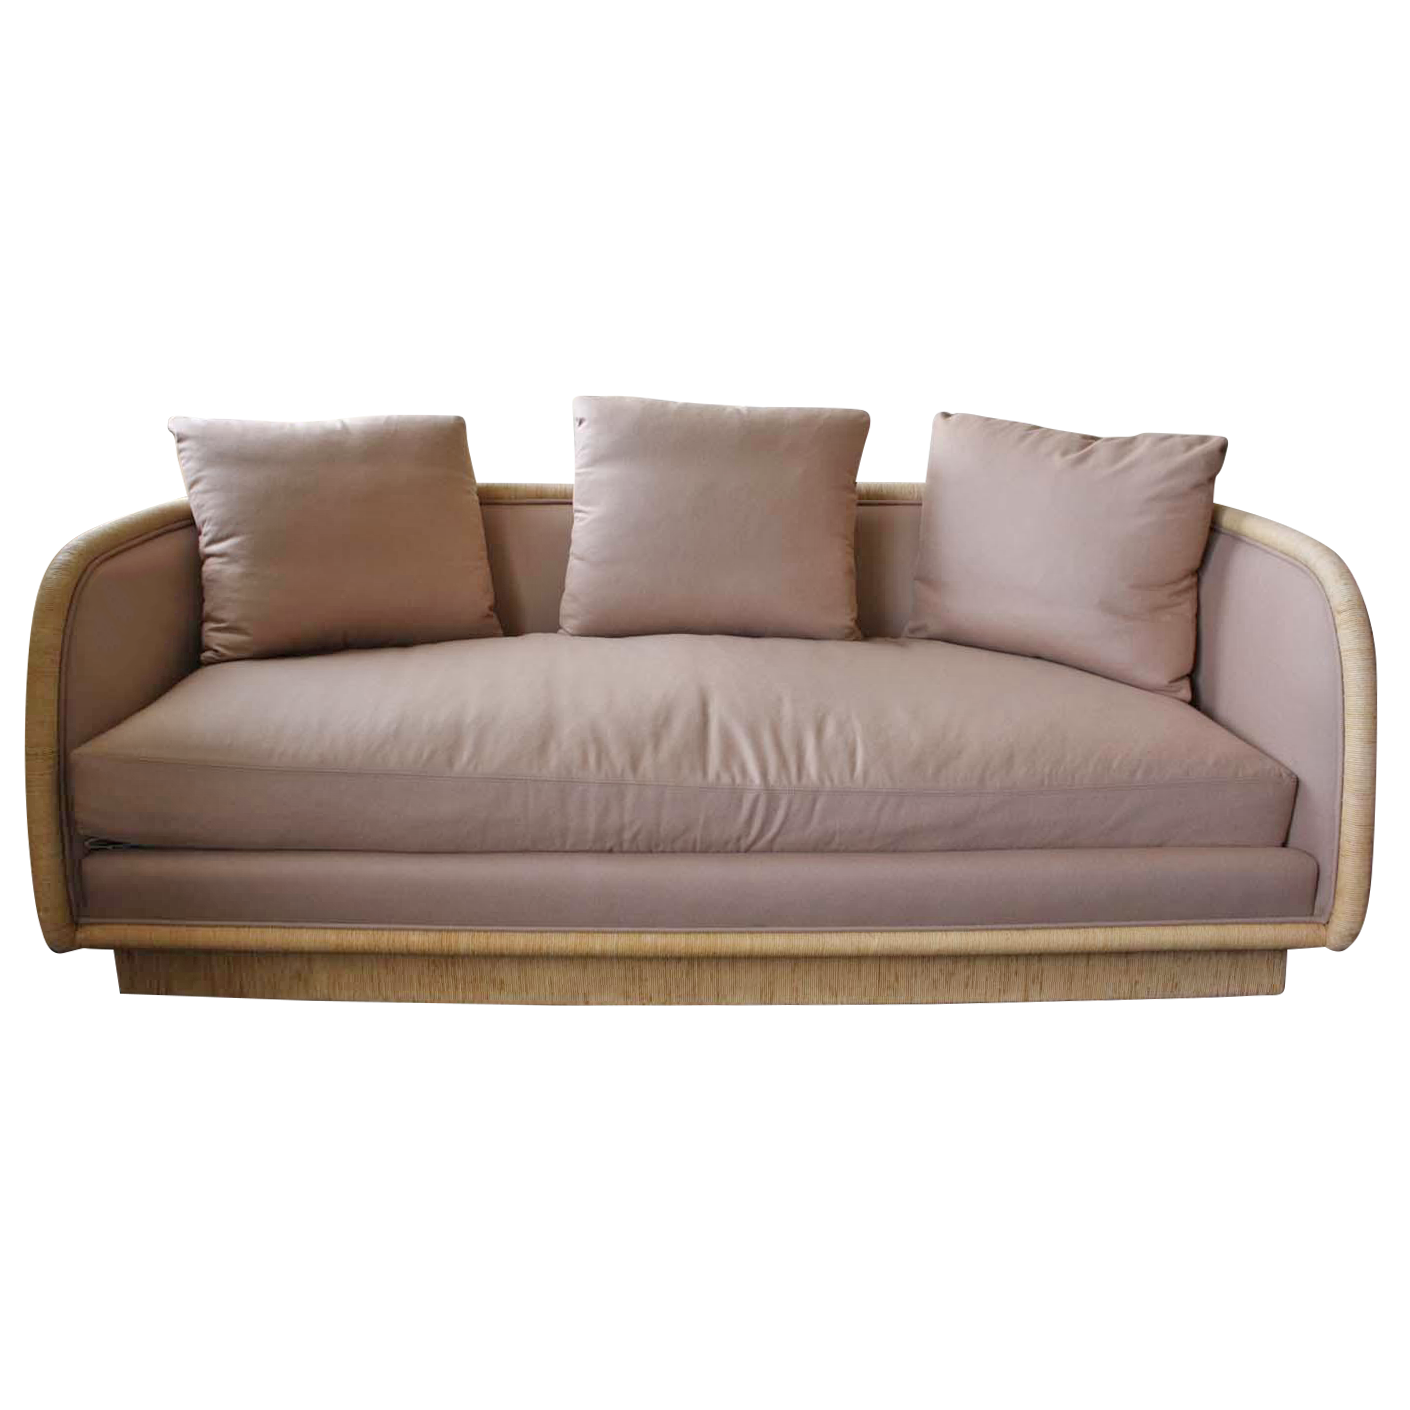 Mcguire Laura Kirar Coastal Upholstered Sofa Chairish